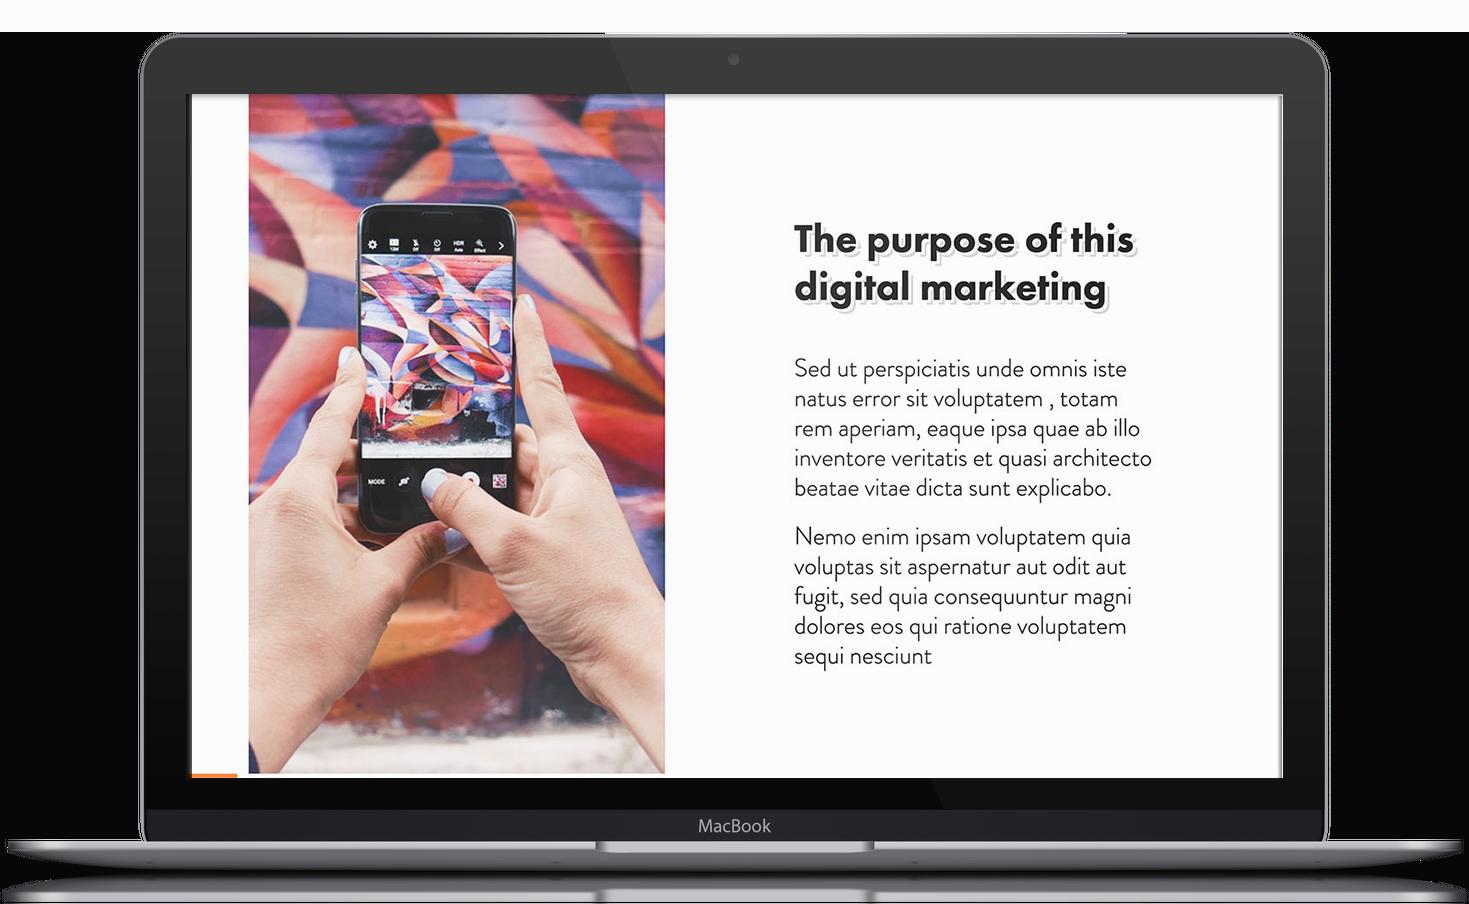 Digital-marketing-proposal-template-1.png